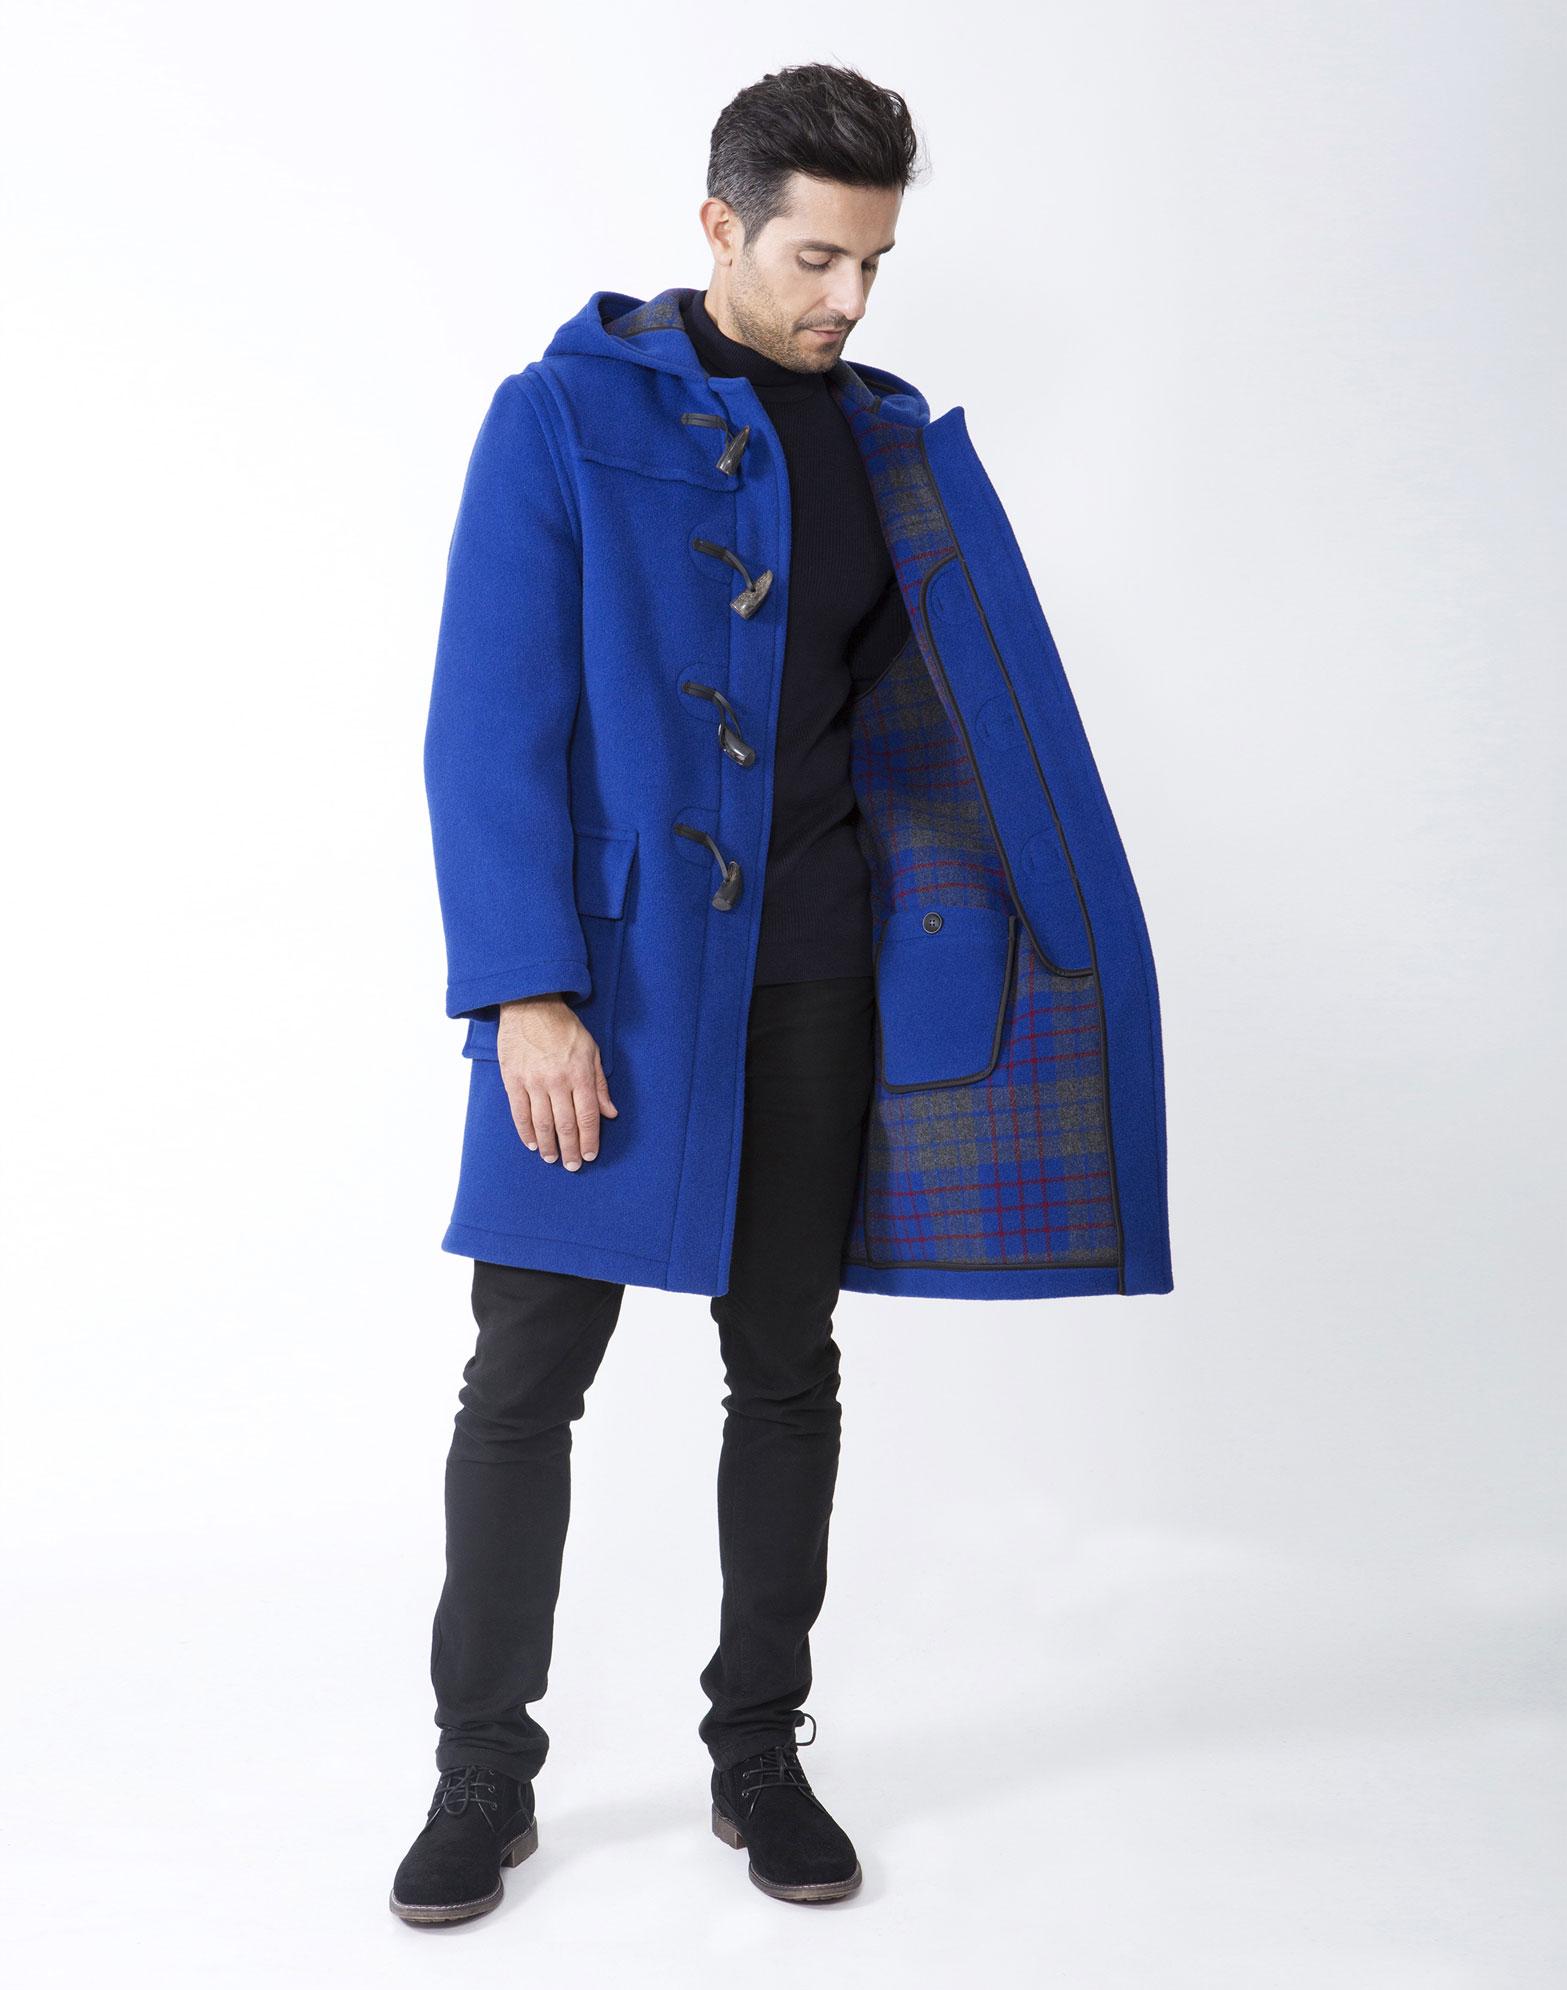 Martin — London Tradition